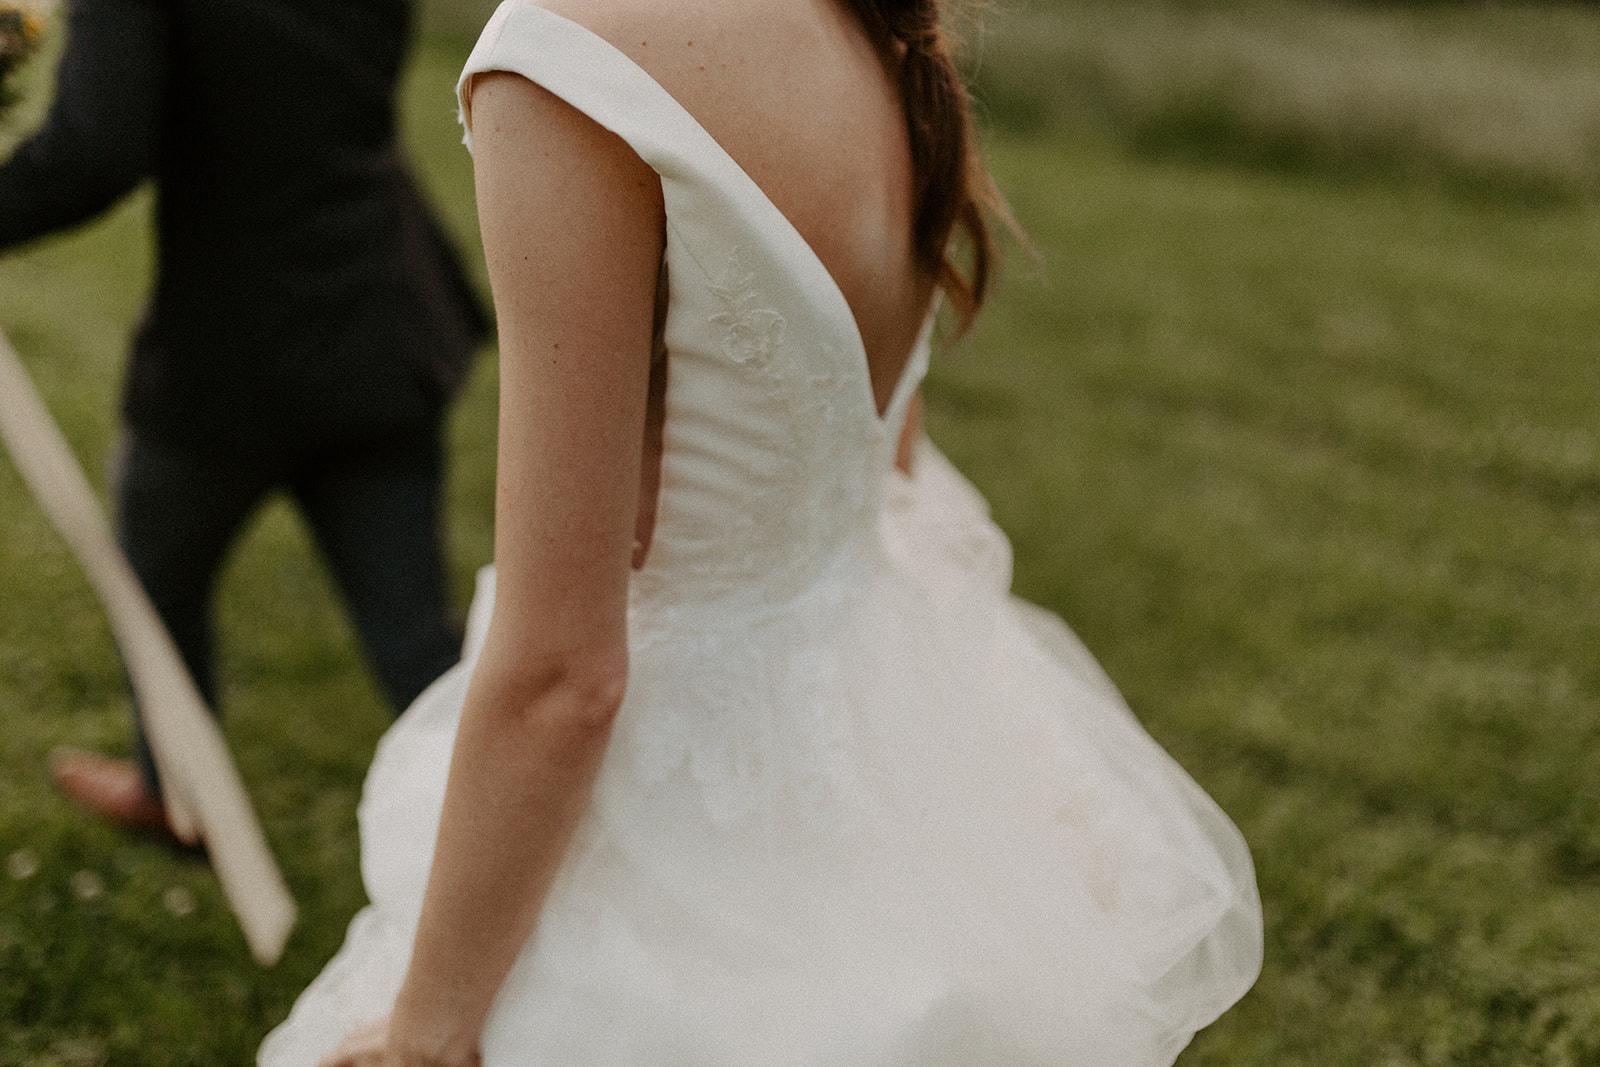 camp_wokanda_peoria_illinois_wedding_photographer_wright_photographs_bliese_0809.jpg